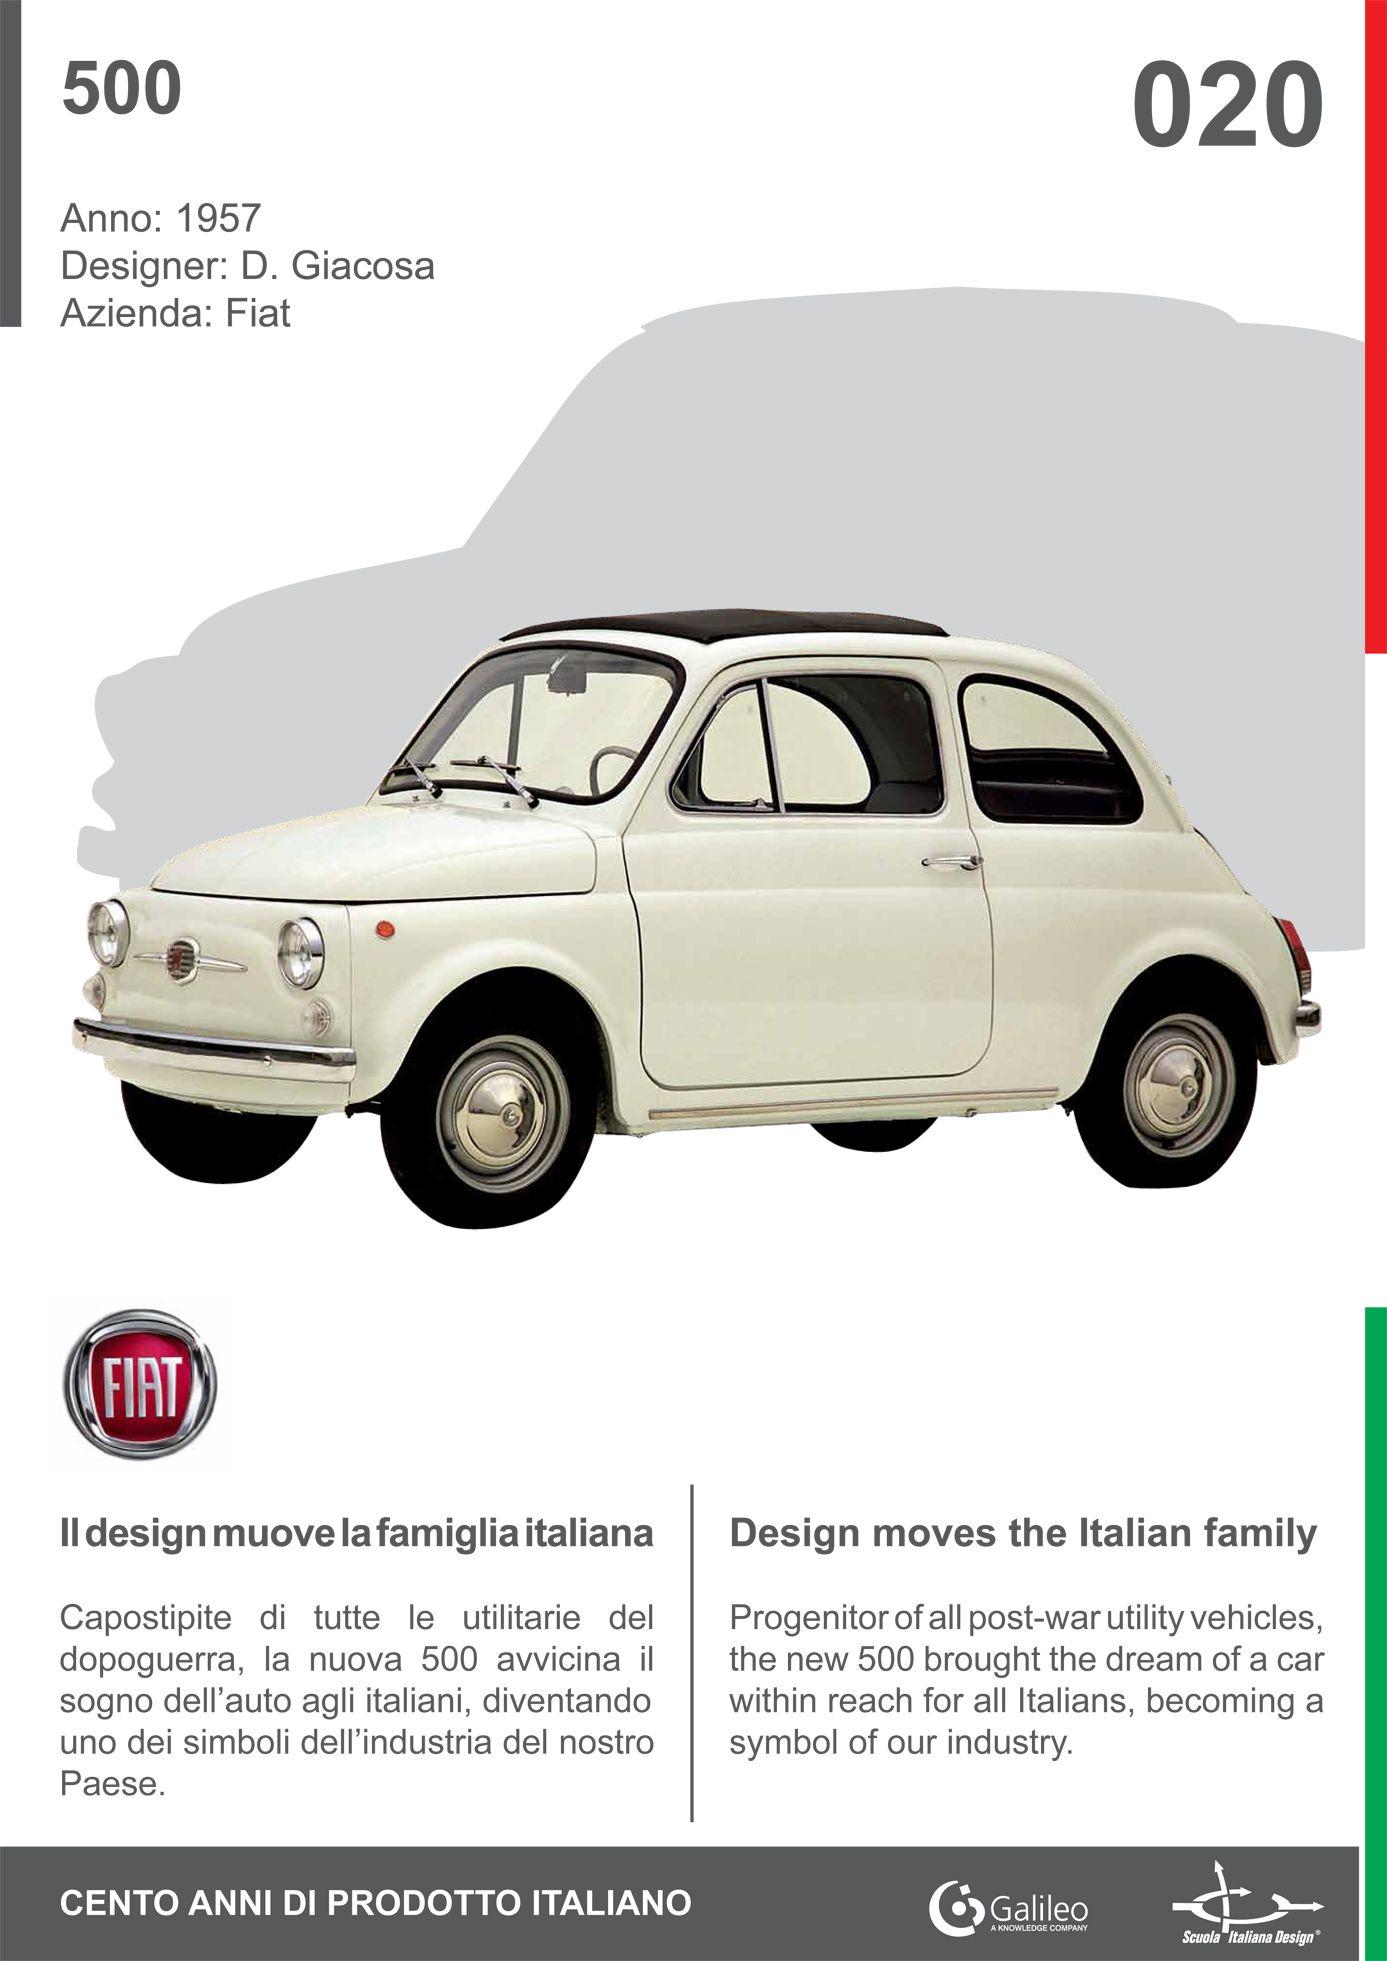 500 by fiat 1957 italian design history car automotive 500 by fiat 1957 italian design history car automotive biocorpaavc Choice Image